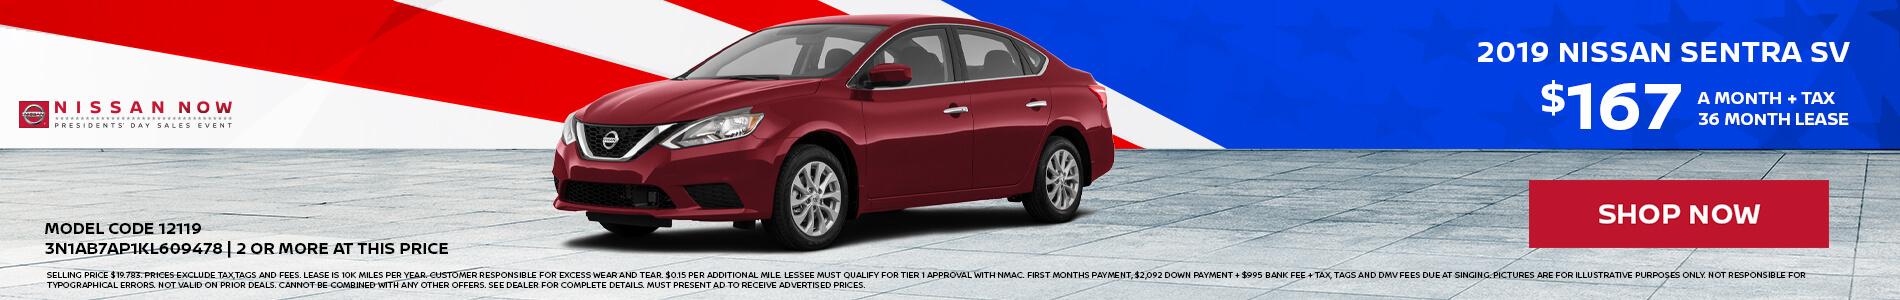 Nissan Sentra $167 Lease